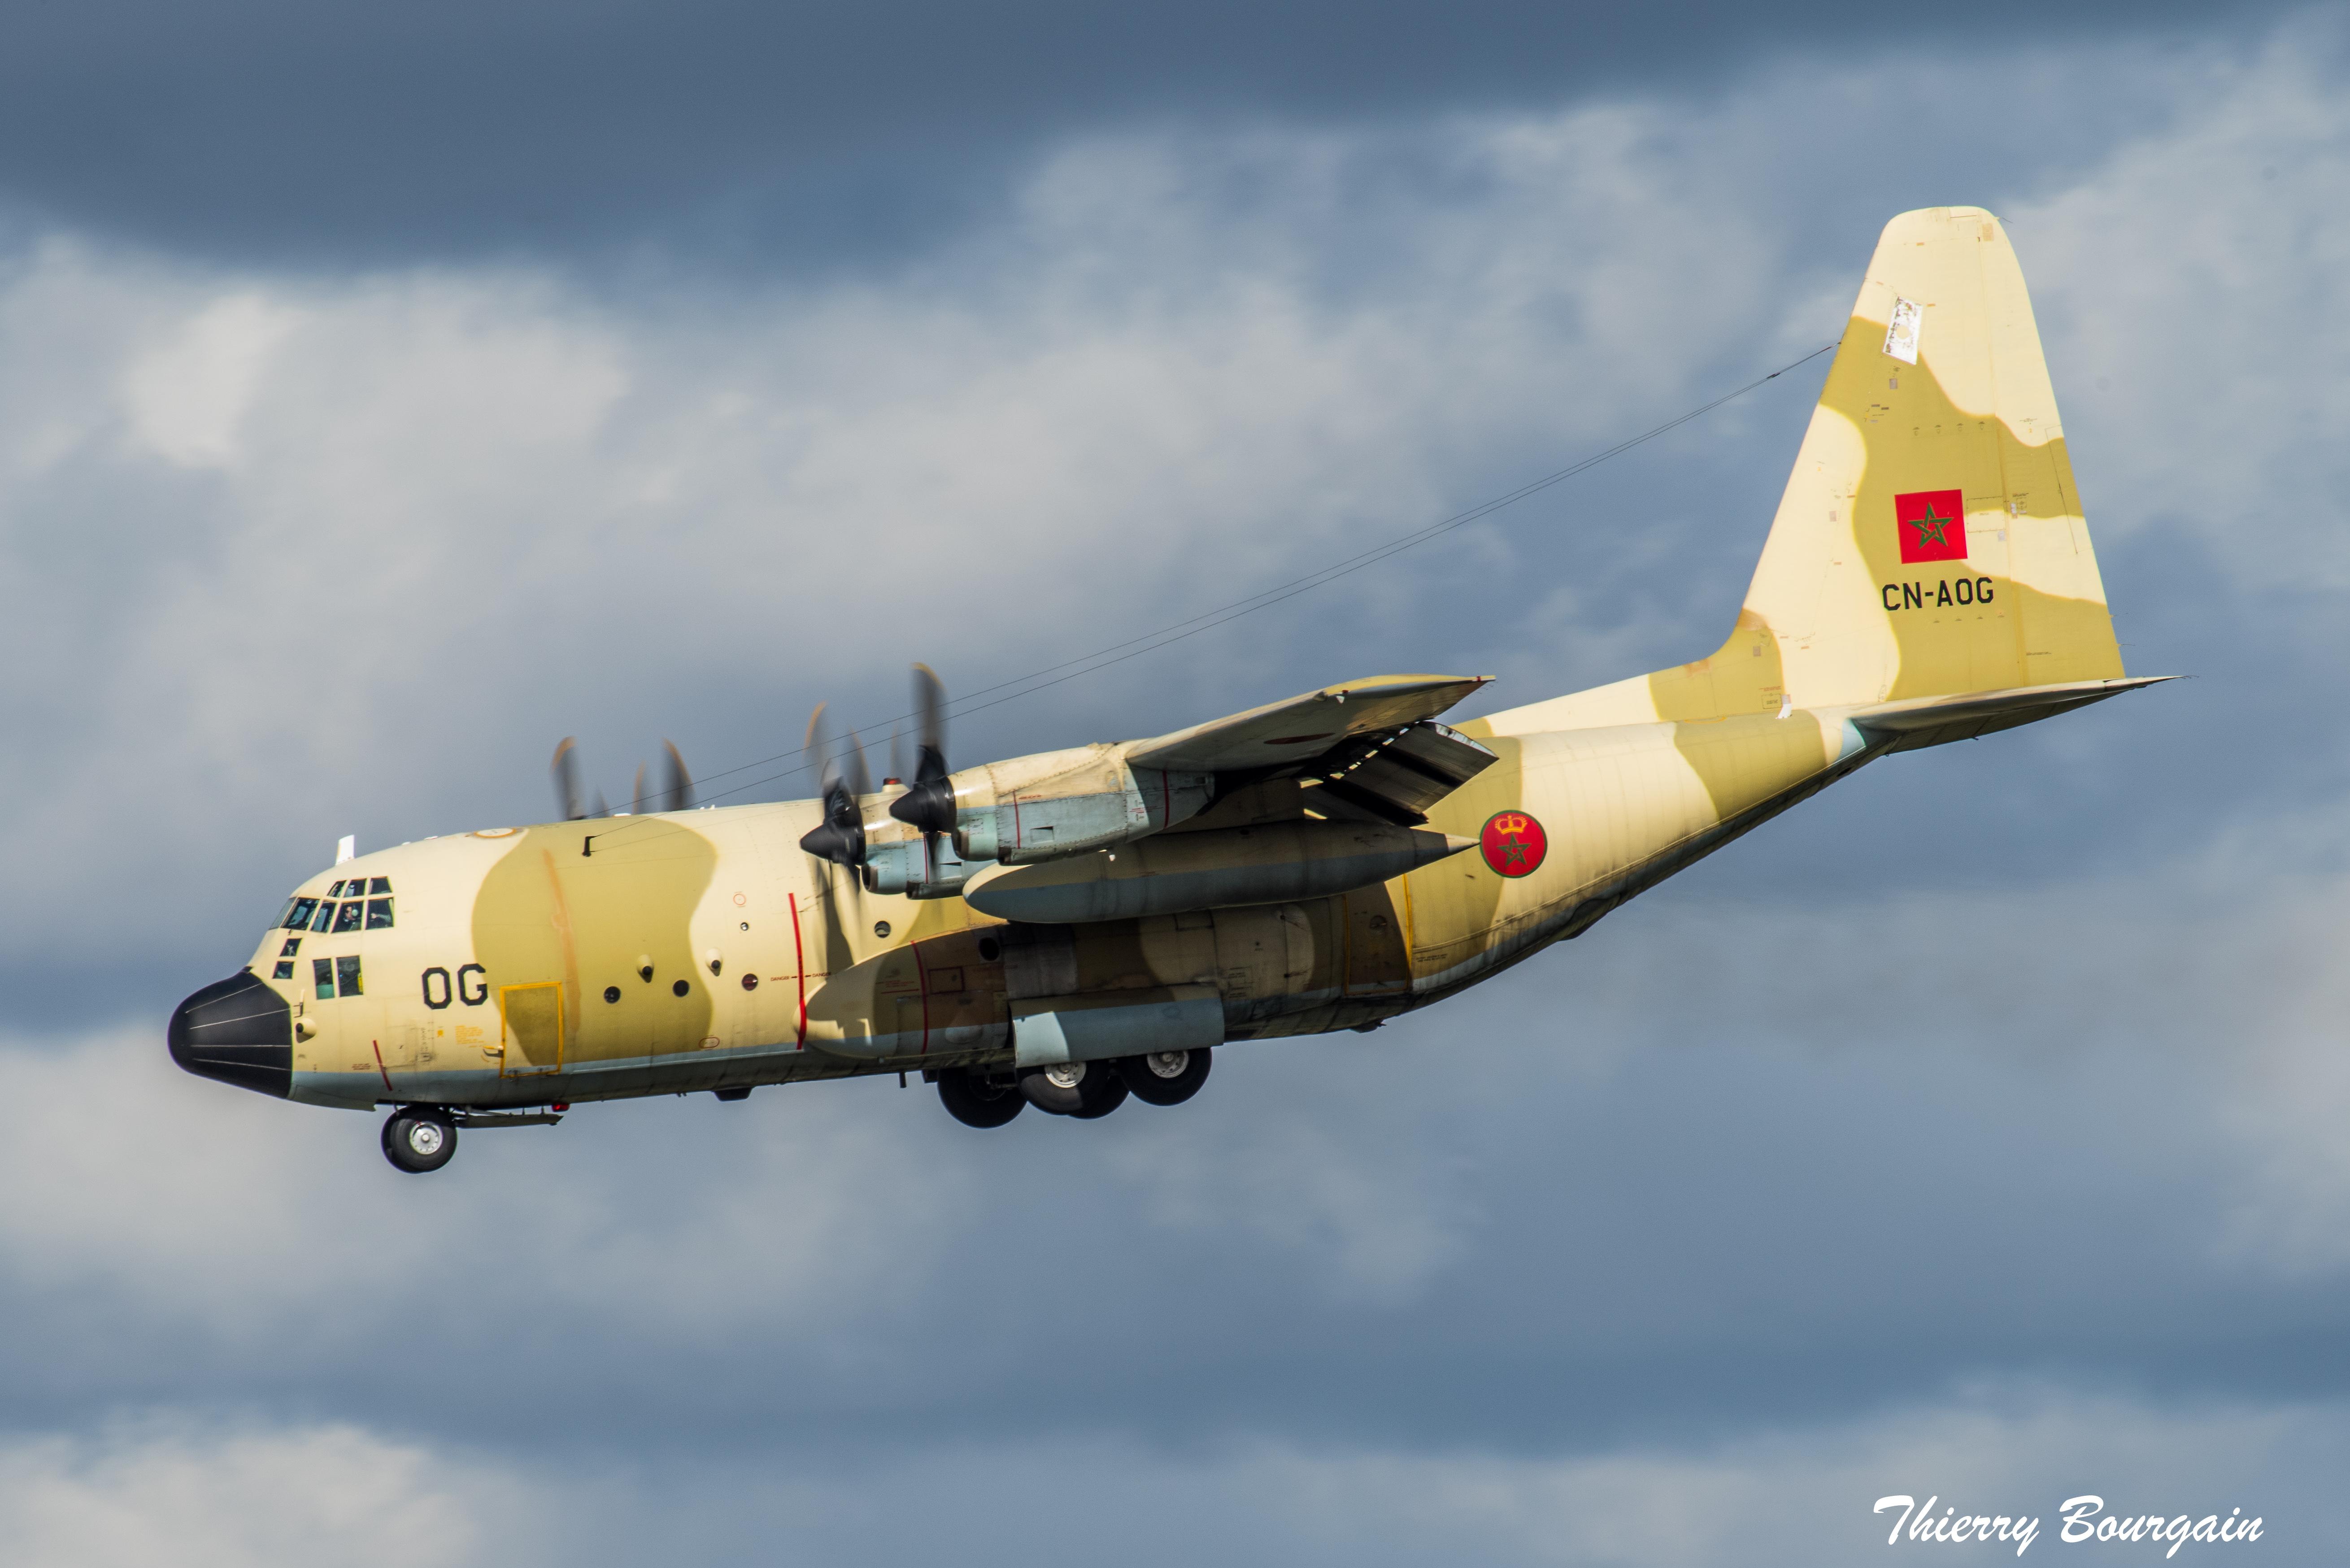 FRA: Photos d'avions de transport - Page 37 33443085618_6a8b89cf51_o